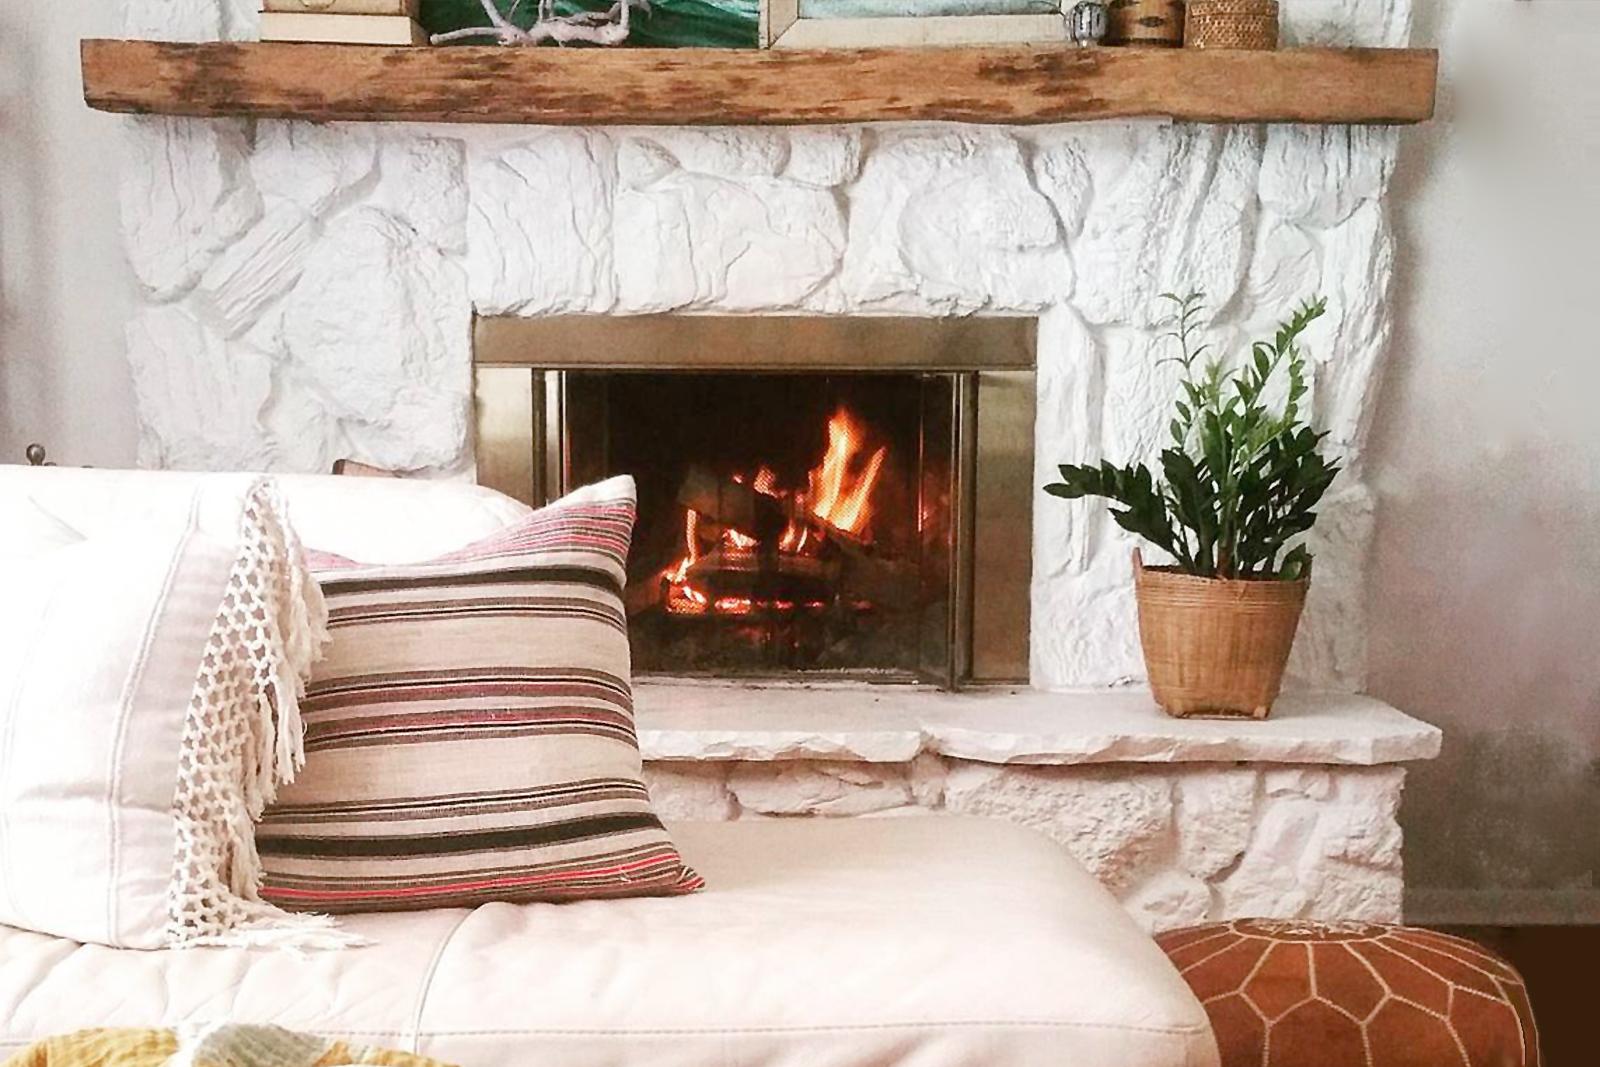 Light-filled living room in winter